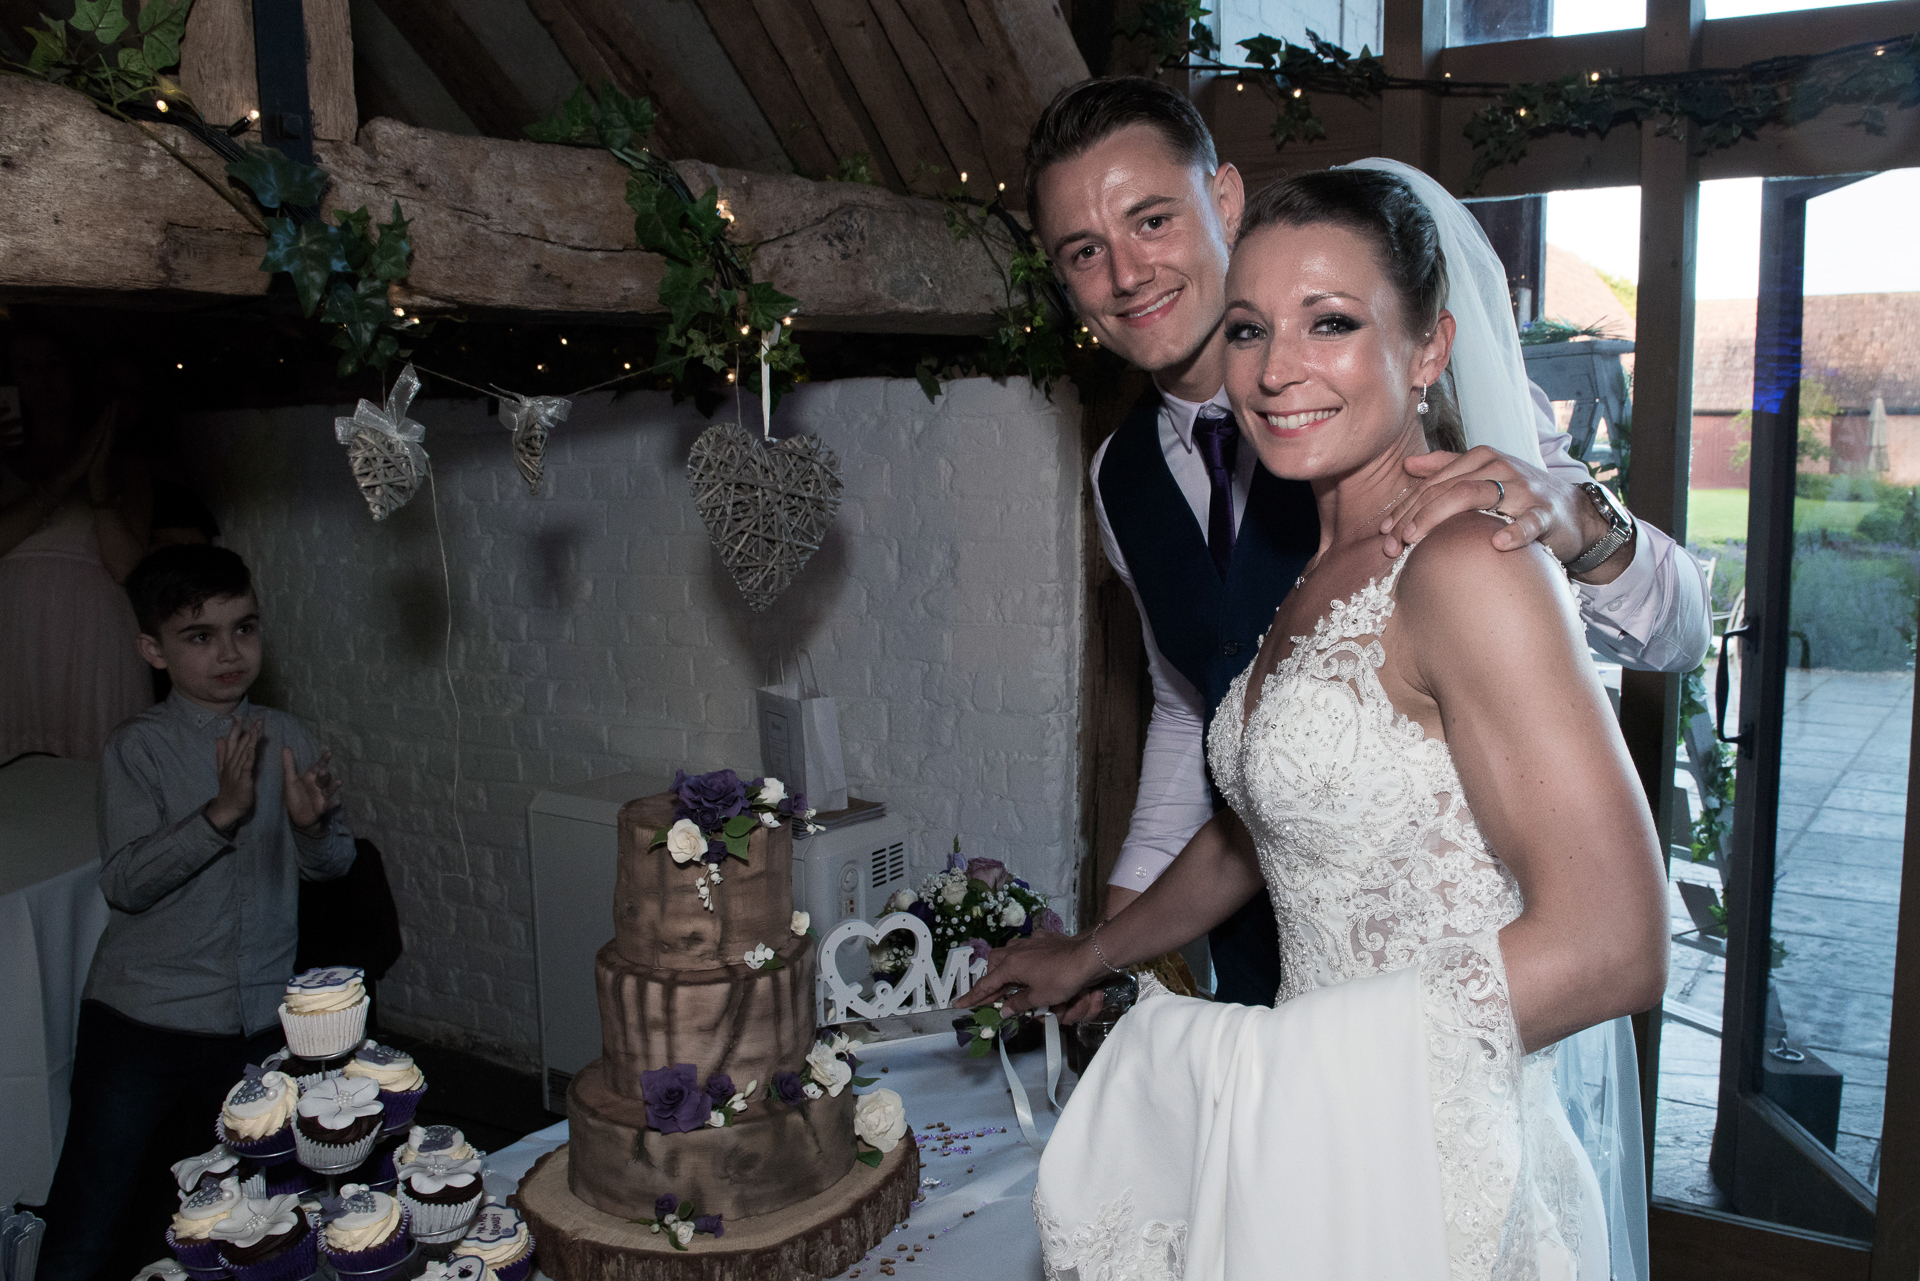 Ufton Court Wedding Photography40.JPG